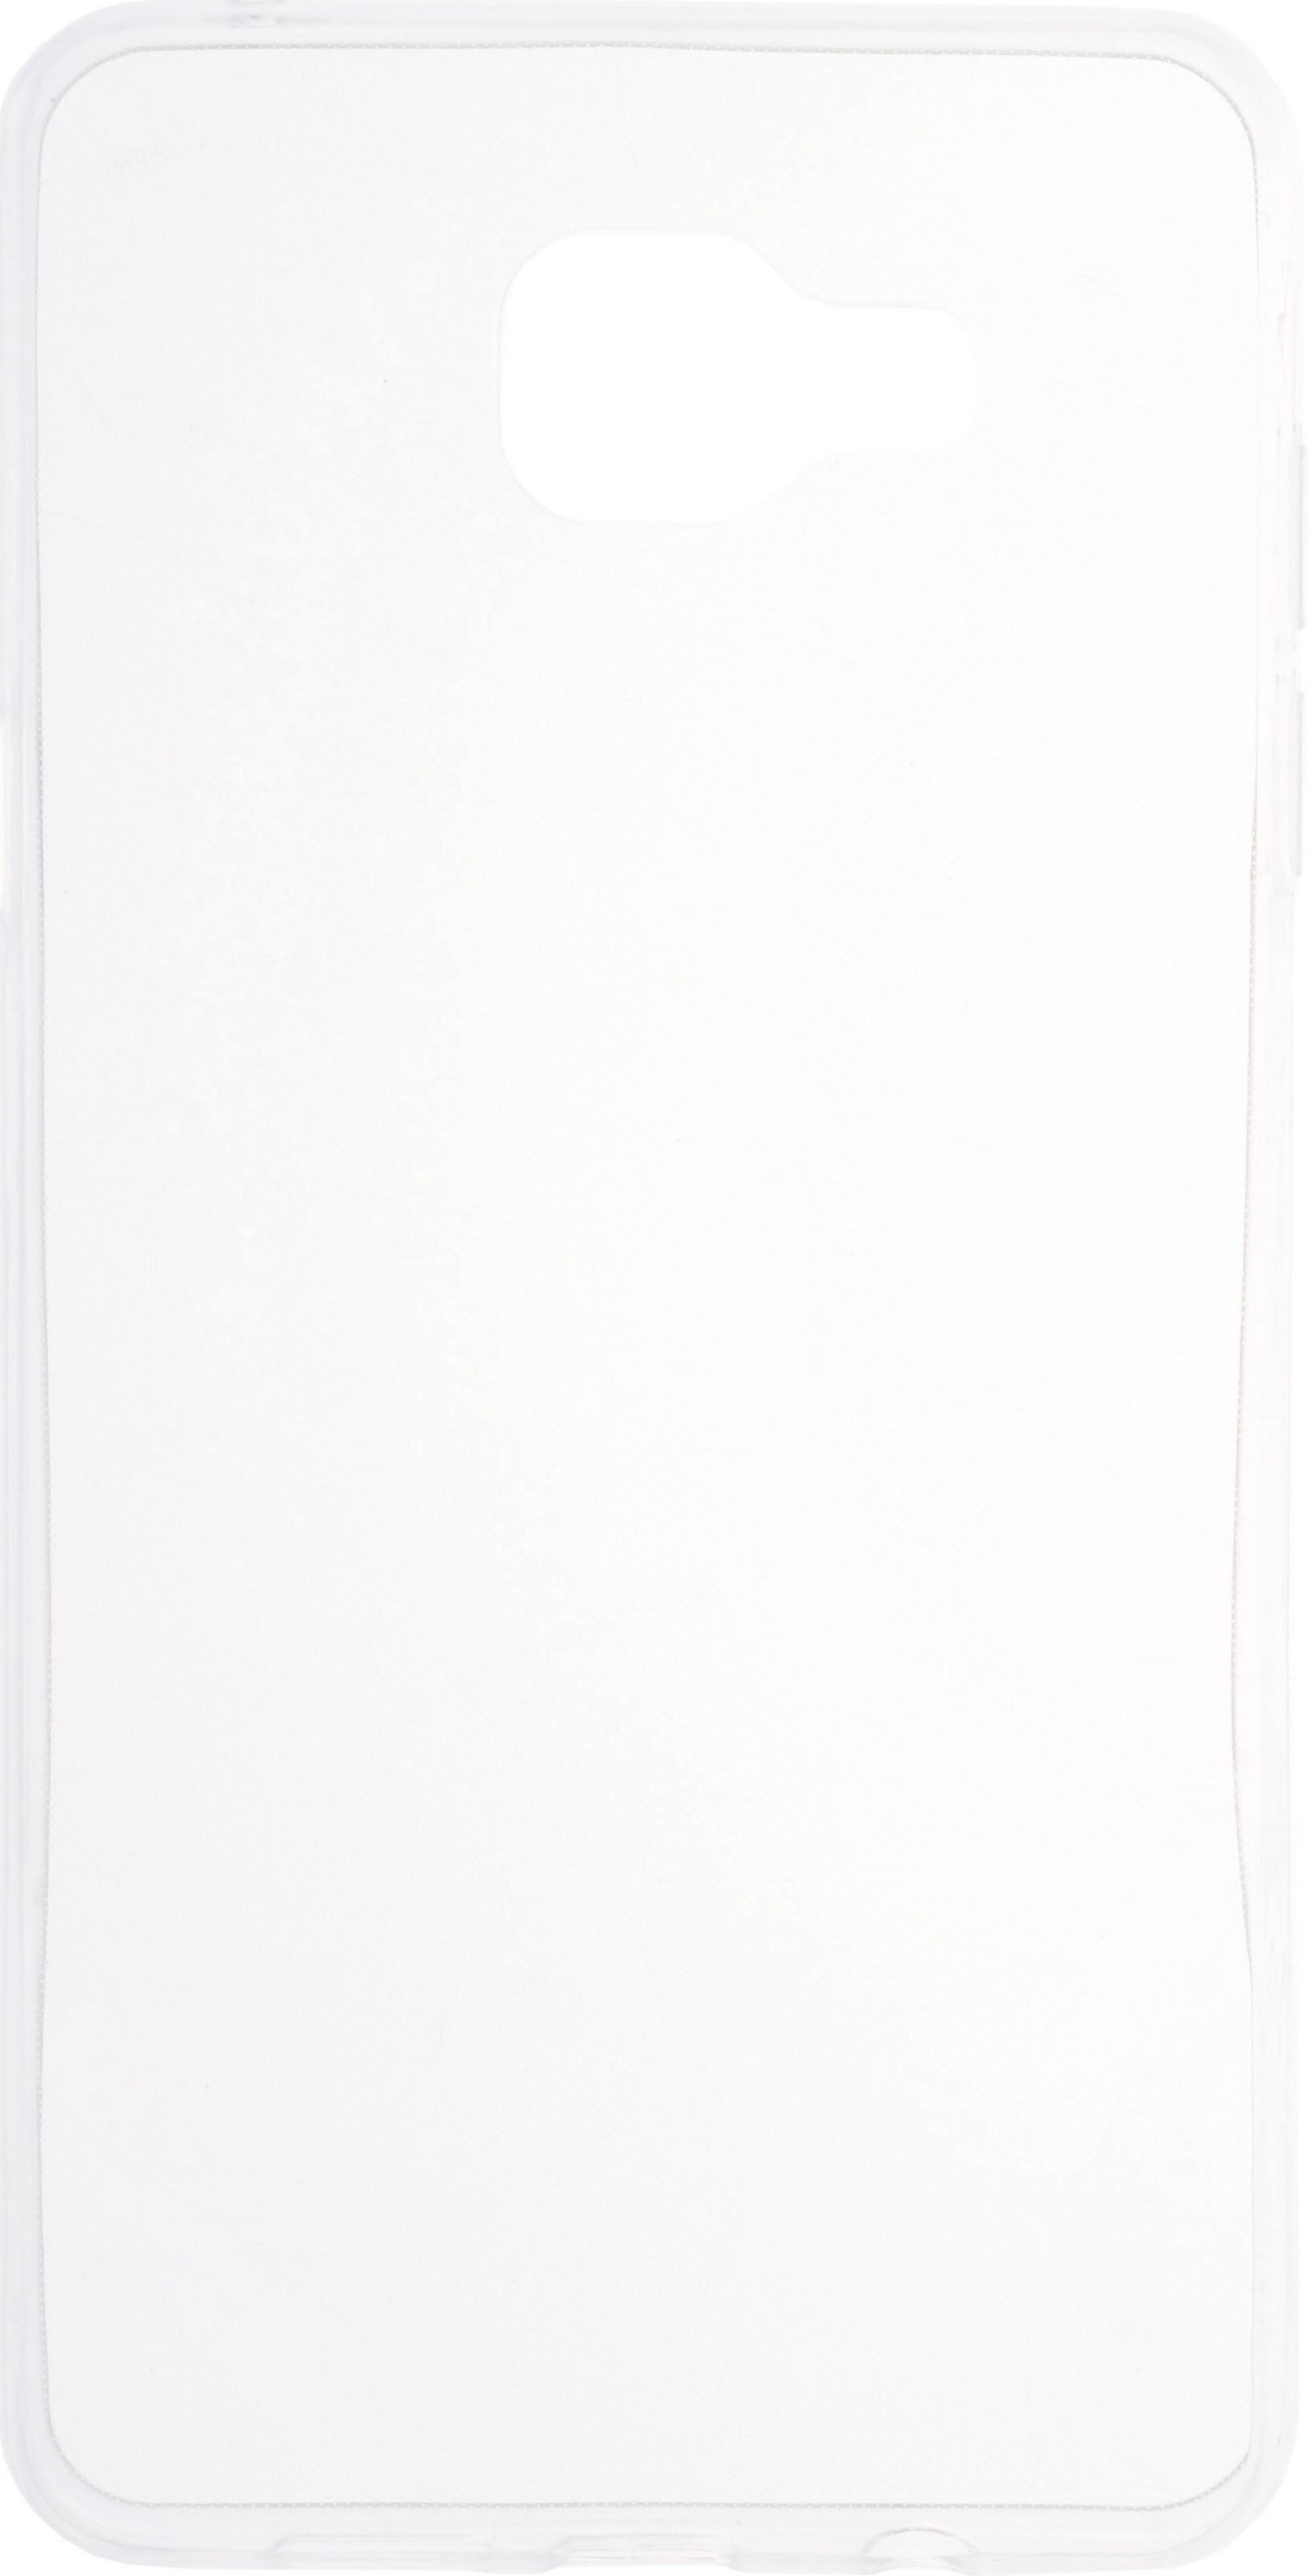 Чехол для сотового телефона skinBOX Slim Silicone, 4630042527843, прозрачный цена и фото